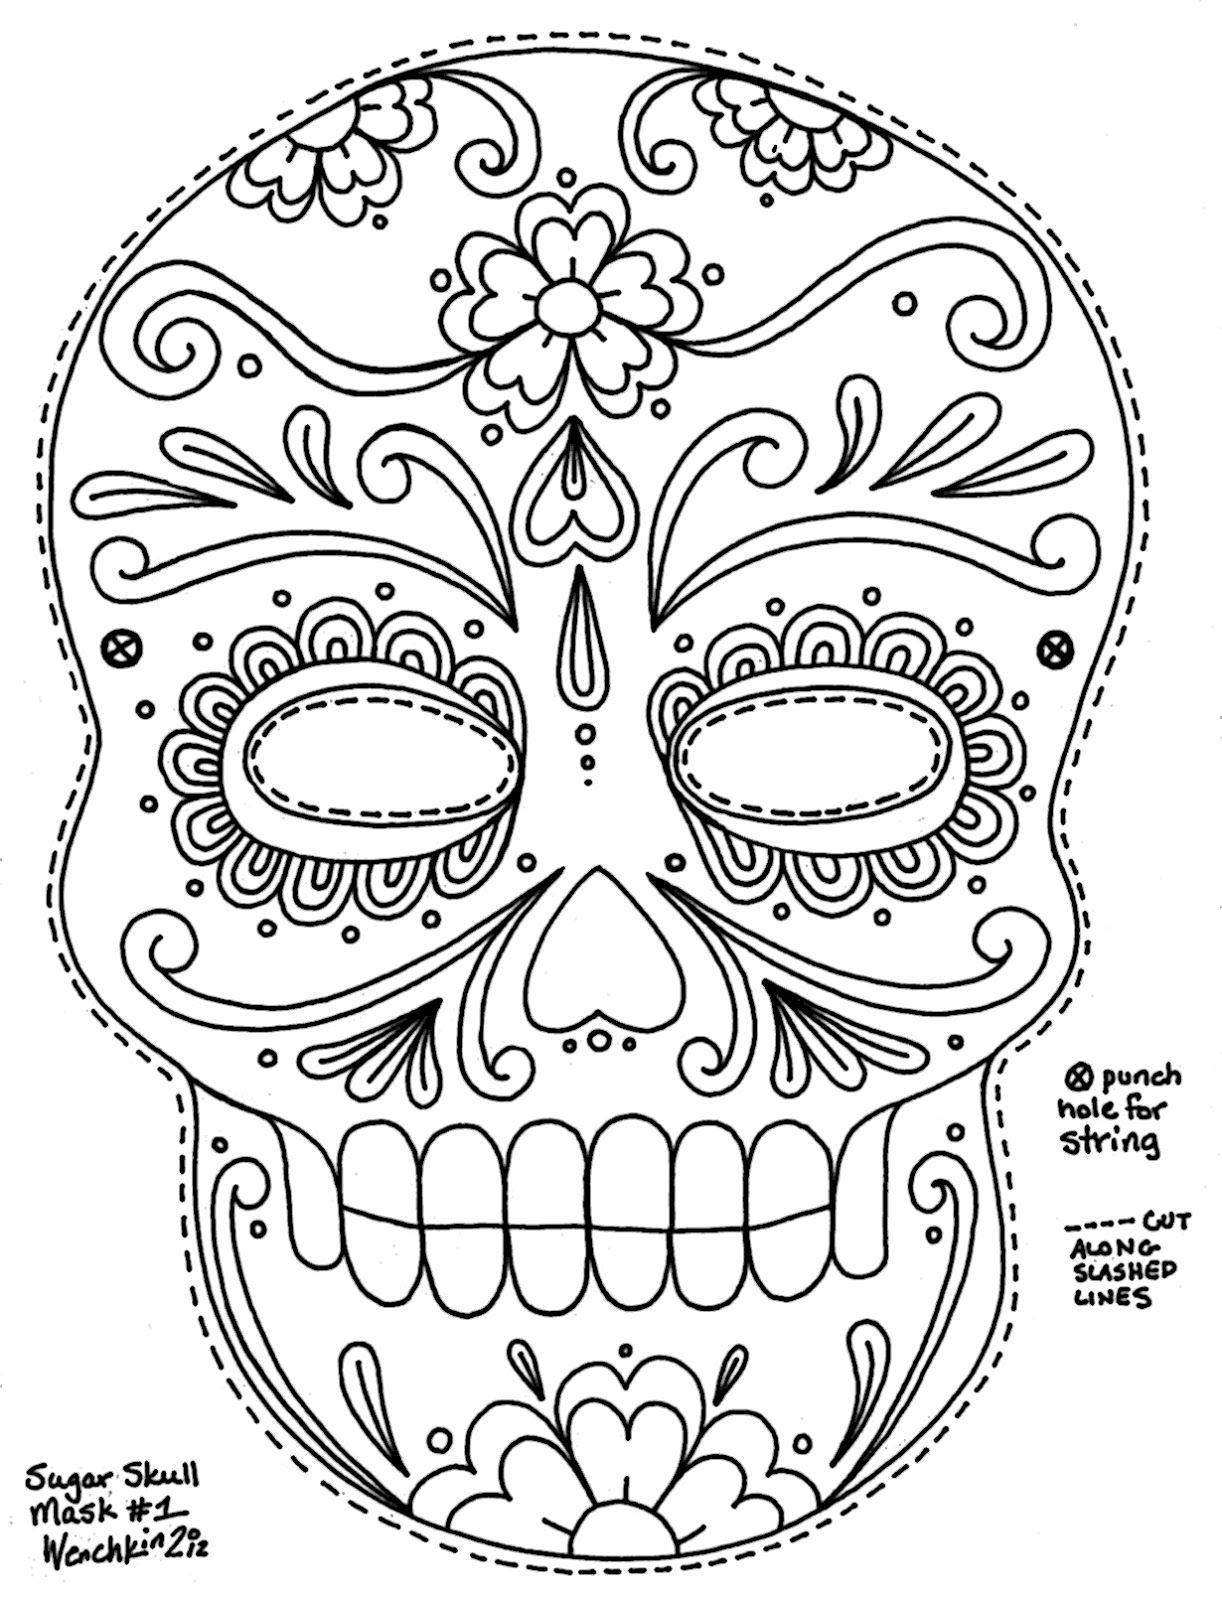 Free Printable Character Face Masks   Seasonal Activities   Skull - Free Printable Halloween Face Masks